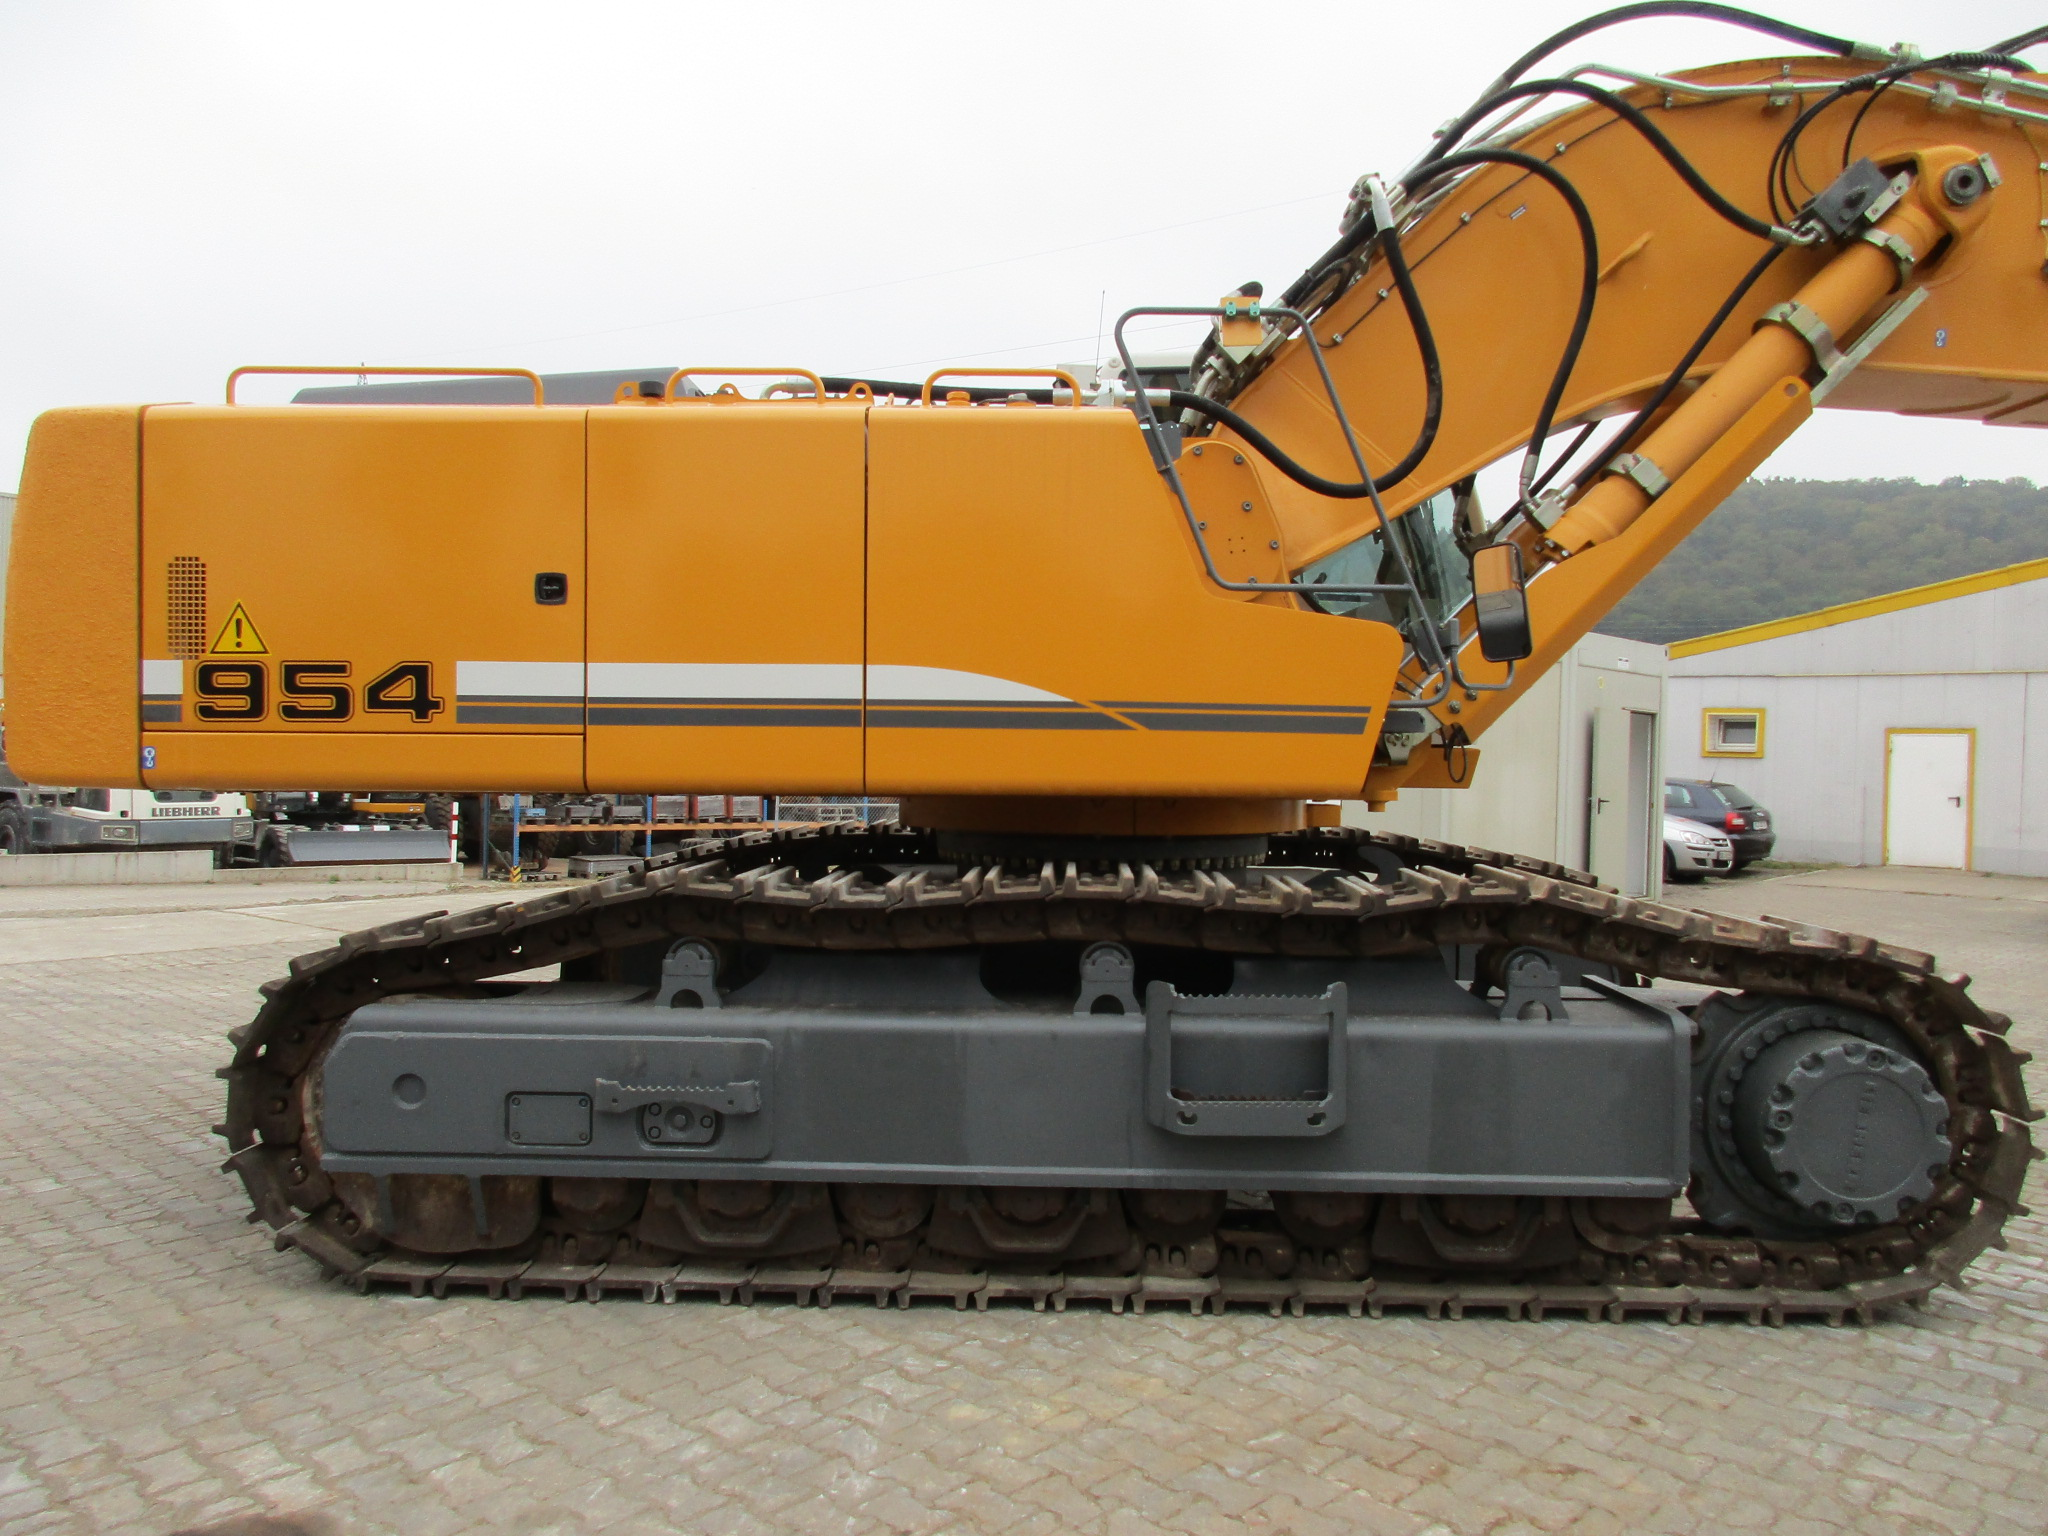 R 954C SHD LI -784-23630_004.JPG